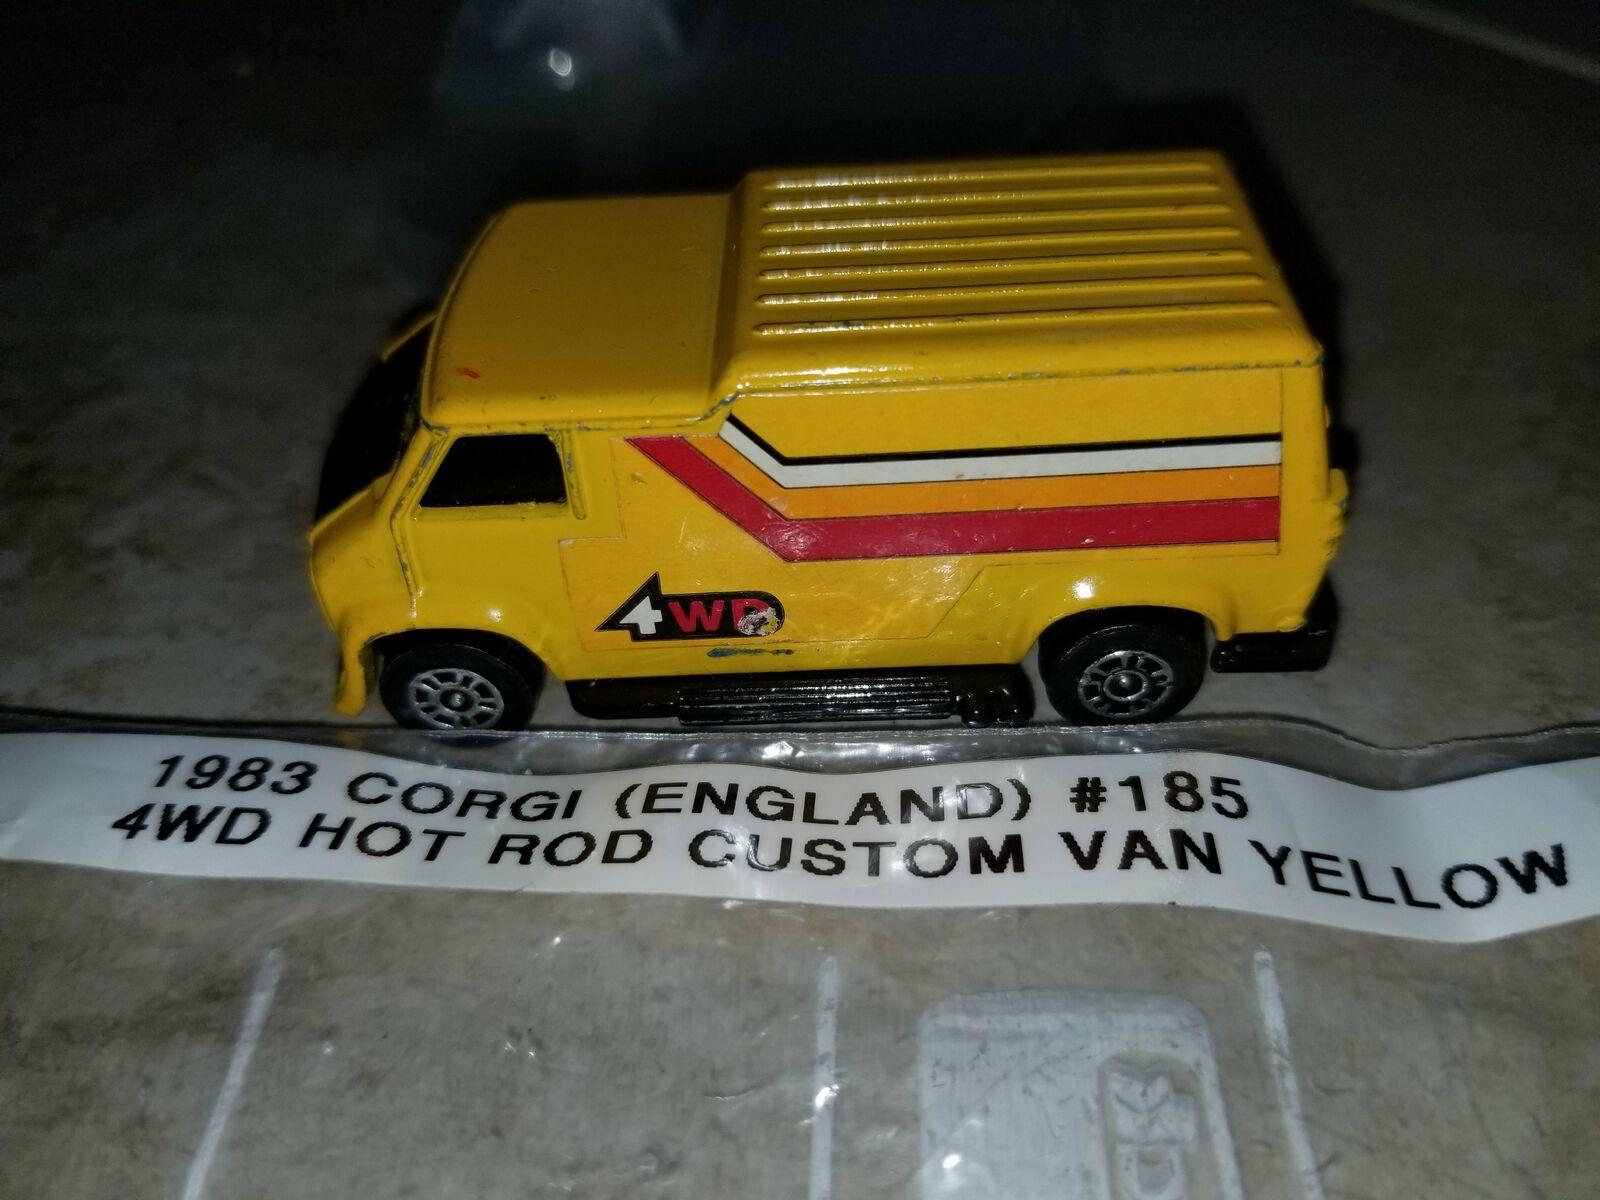 1983 Corgi Uk 185 Hot Rod 4wd Custom Yellow Van For Sale Online